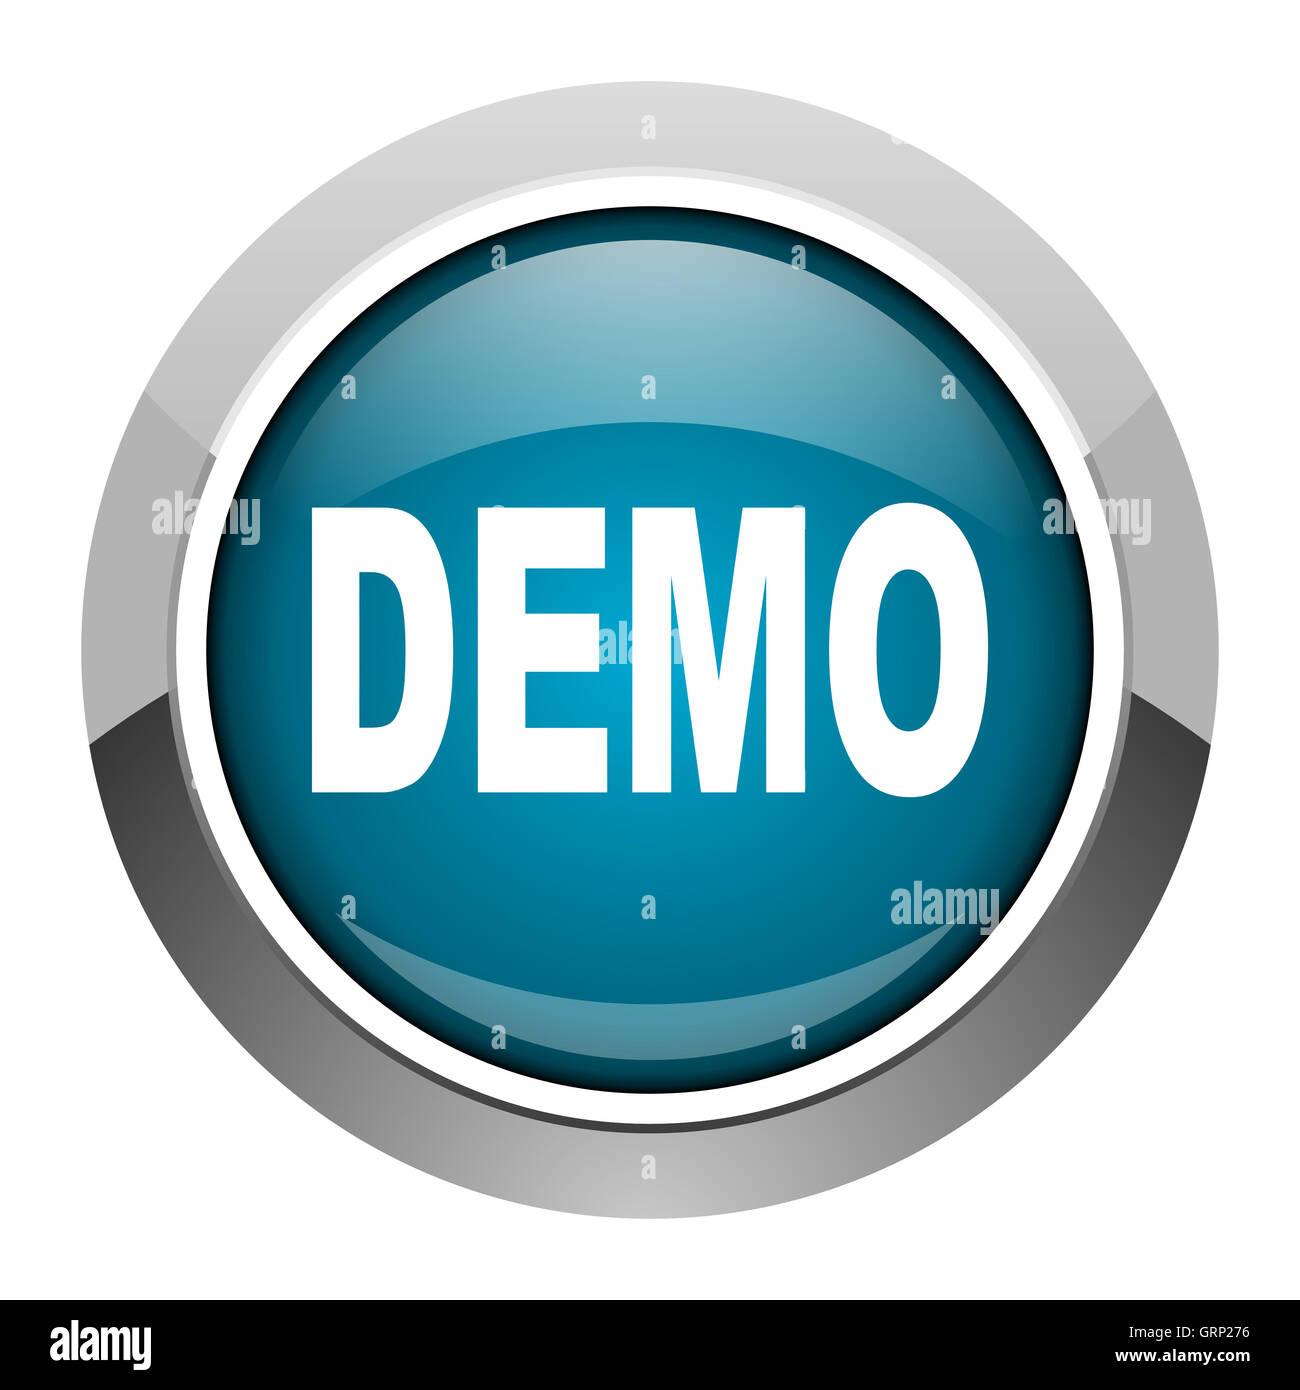 The – Demo